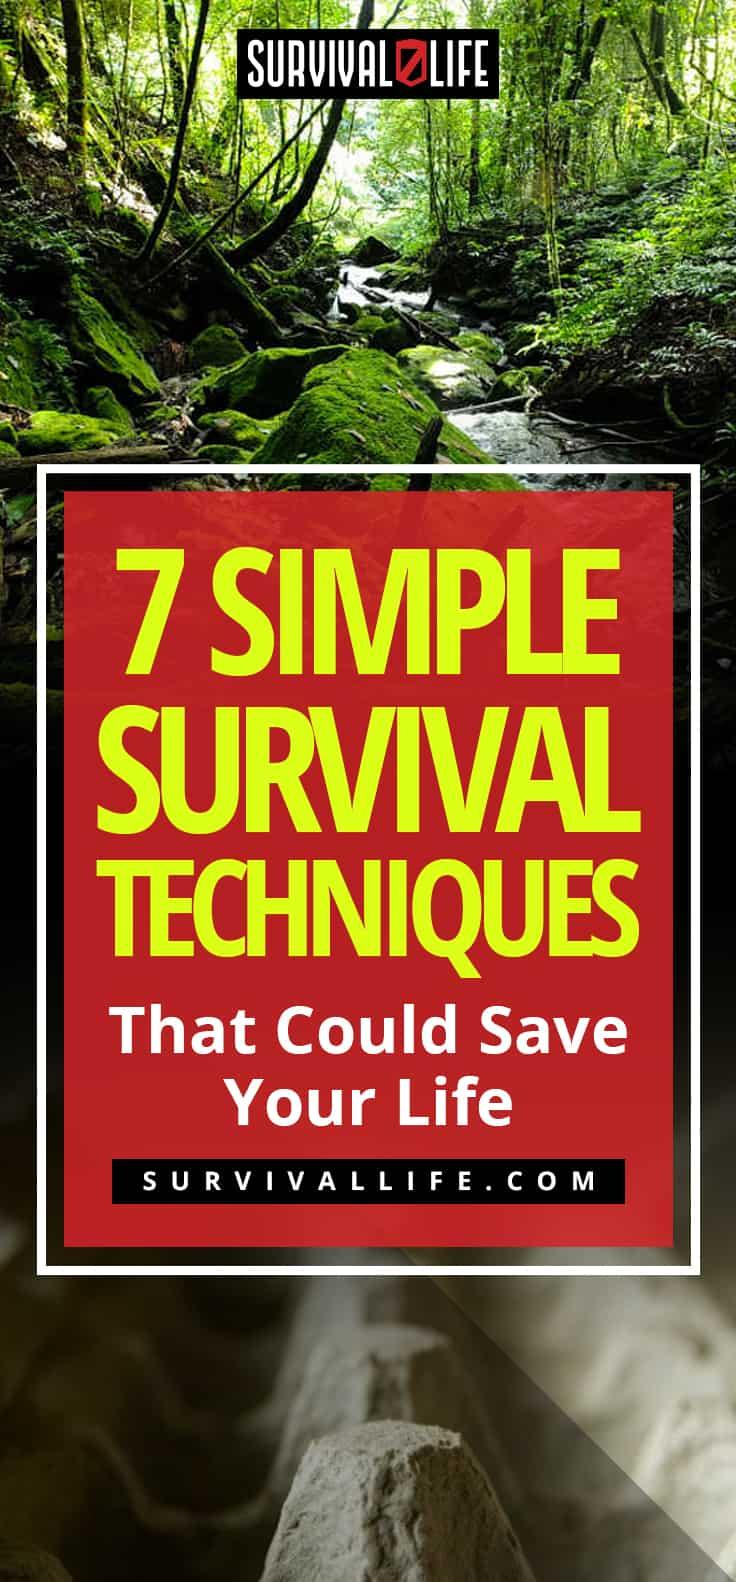 7 Simple Survival Techniques That Could Save Your Life